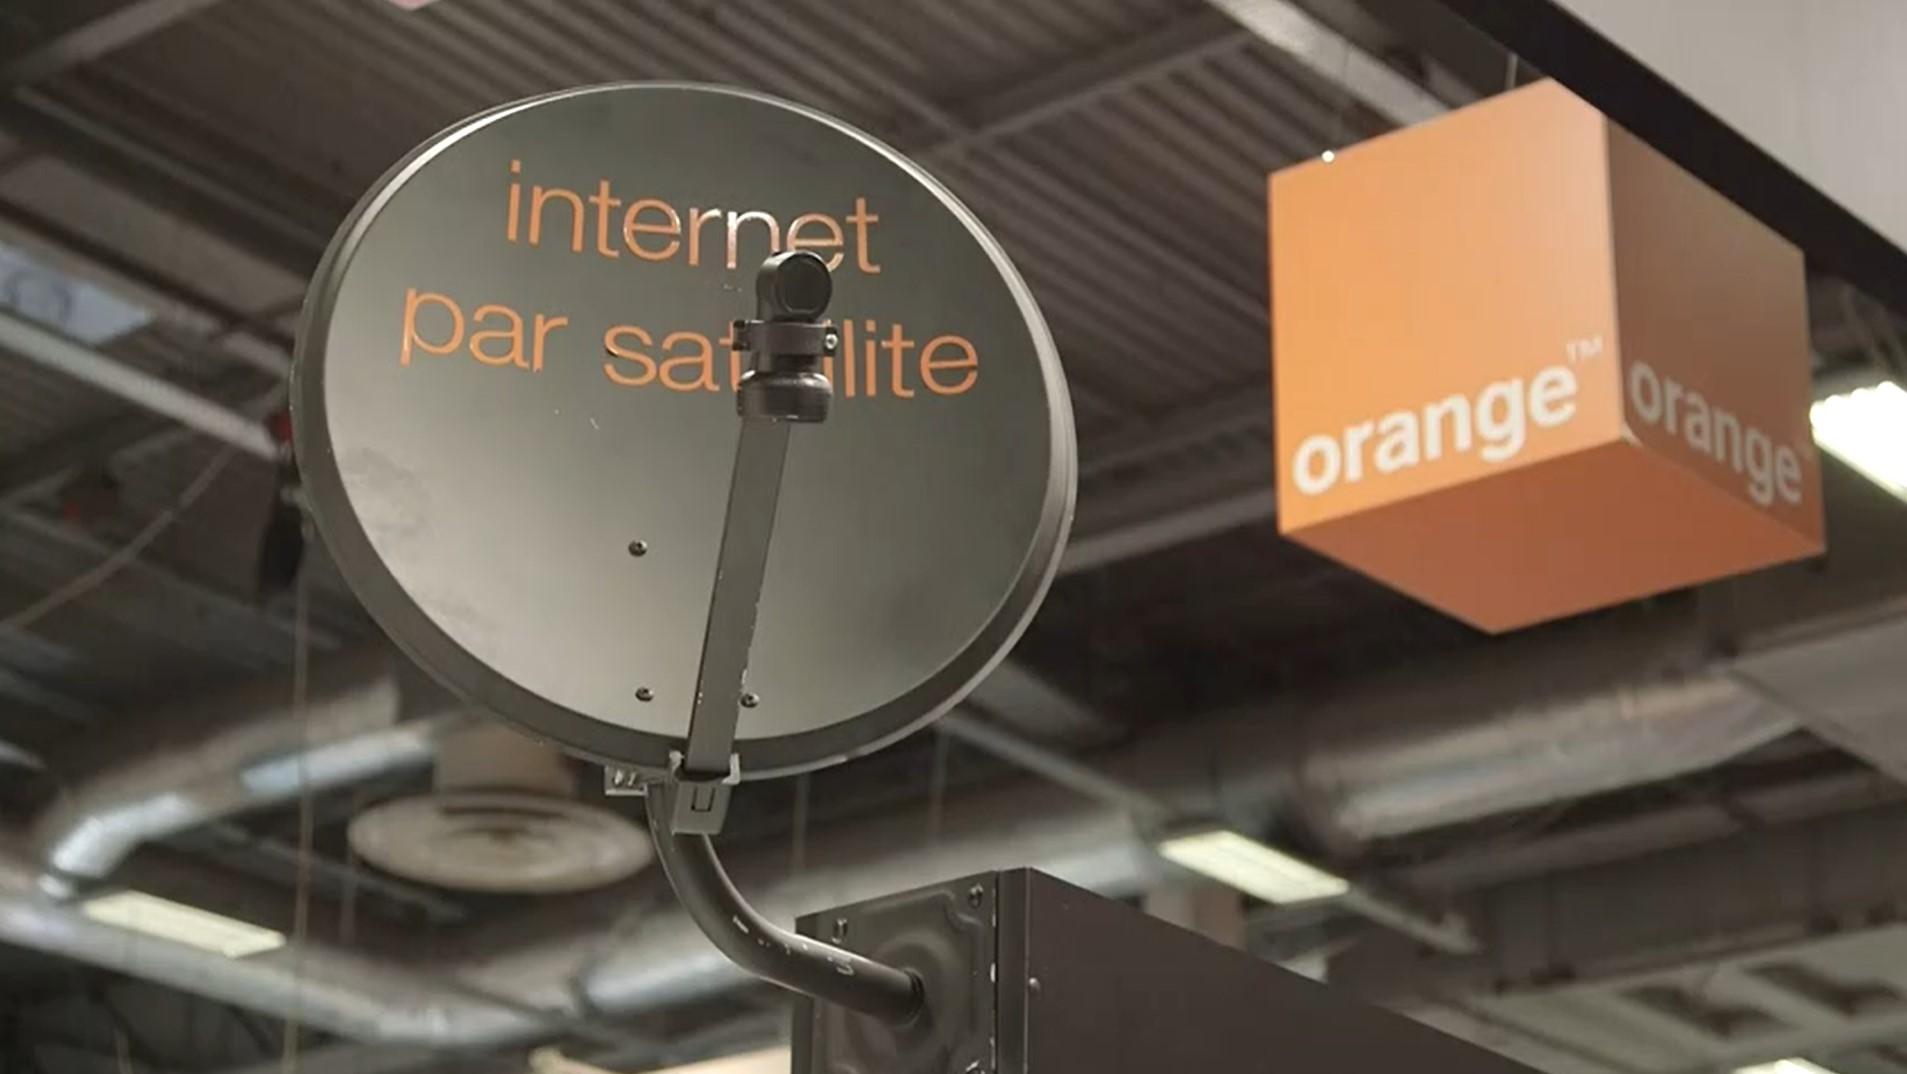 Orange เปิดโปรใหม่ 5G พ่วงเน็ตดาวเทียม ให้บริการความเร็ว 100 Mbps เชื่อมต่อย่าน 3.5 GHz และ 2.1 GHz